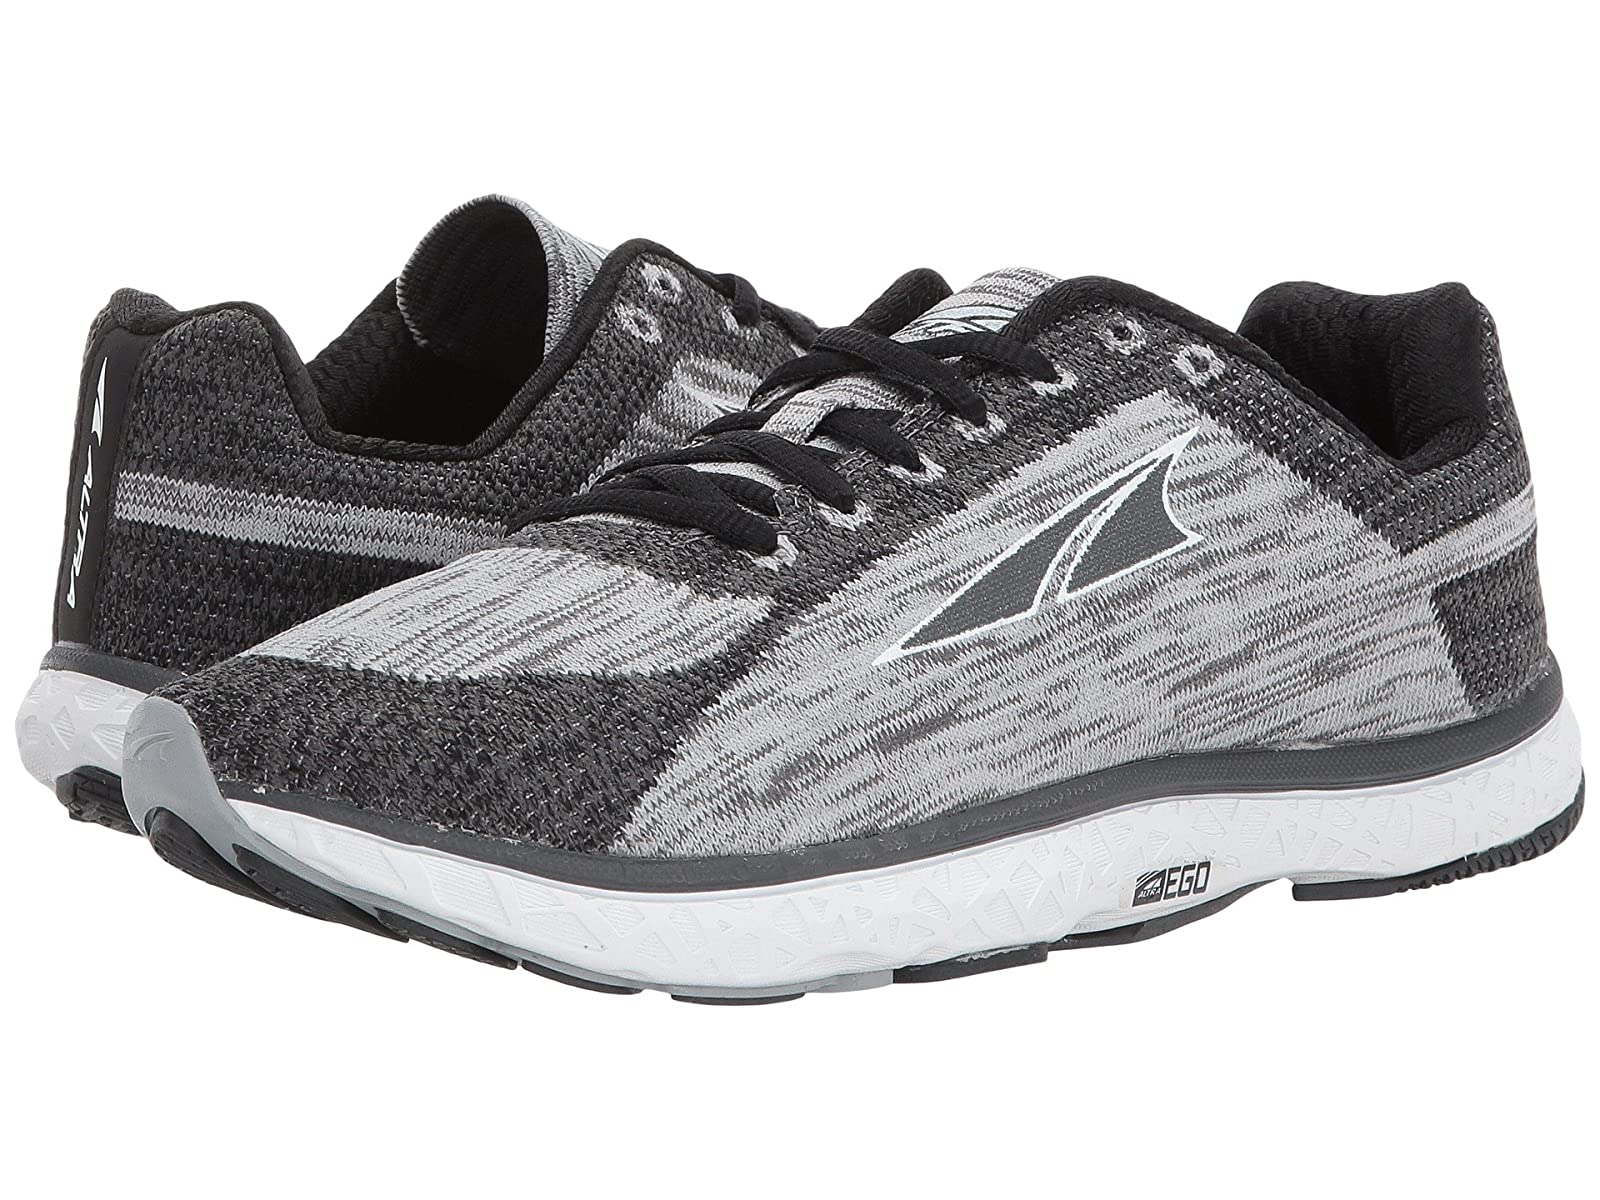 Altra Footwear EscalanteAtmospheric grades have affordable shoes